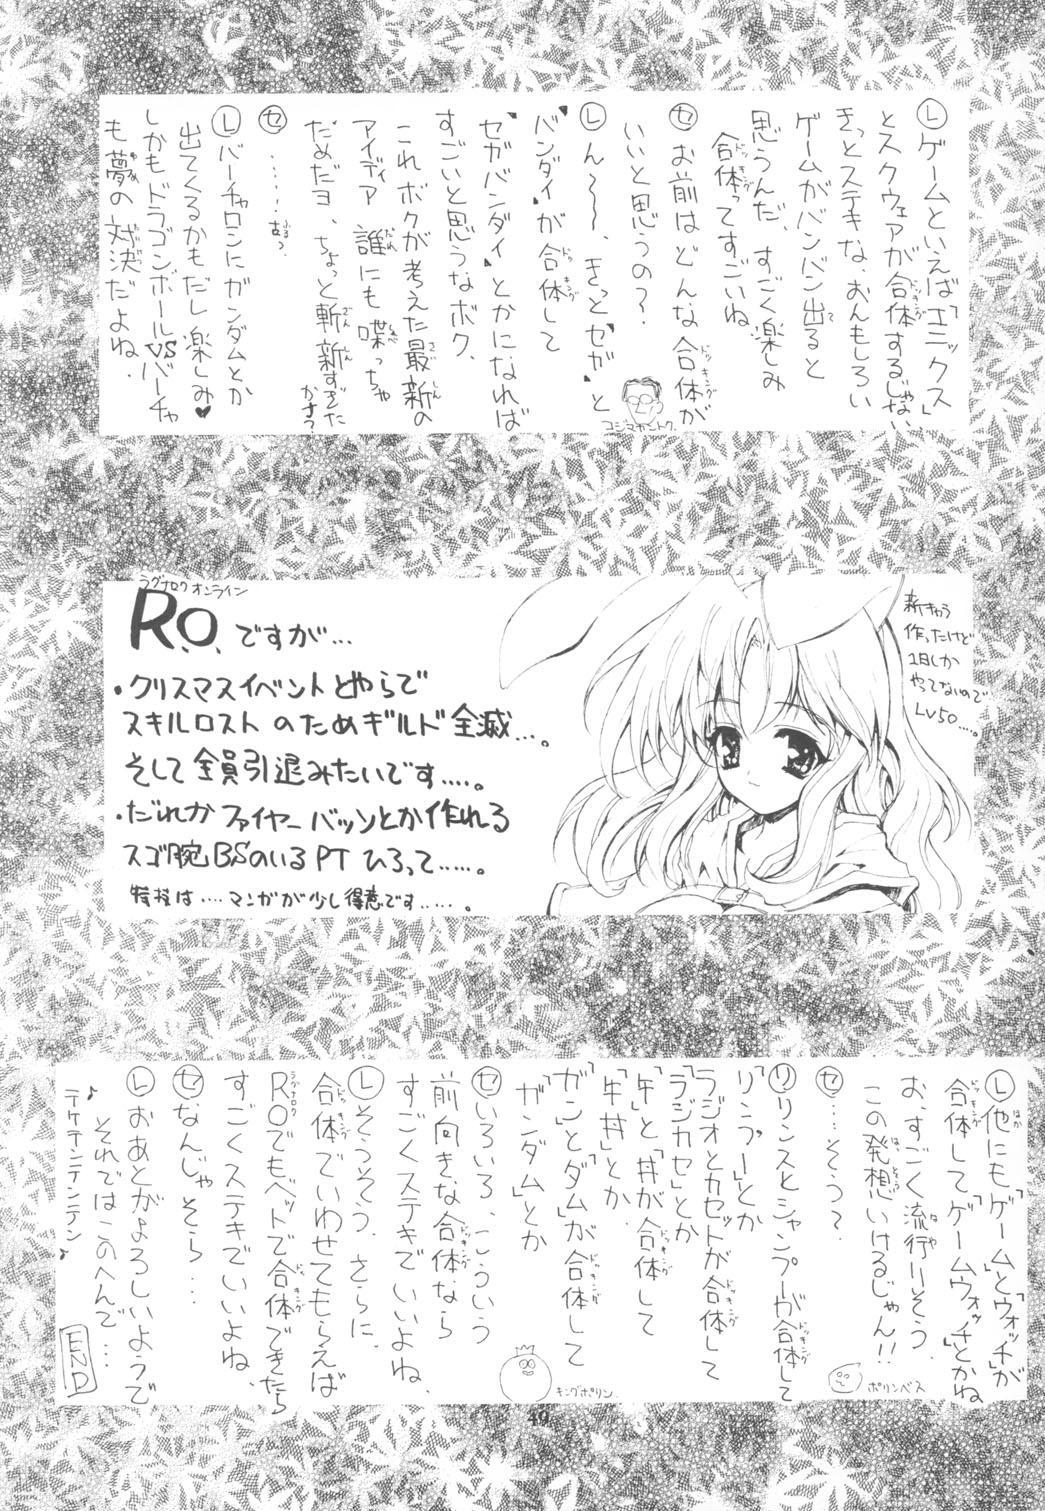 KAISHAKU RAGUNAROK ONLINE 48